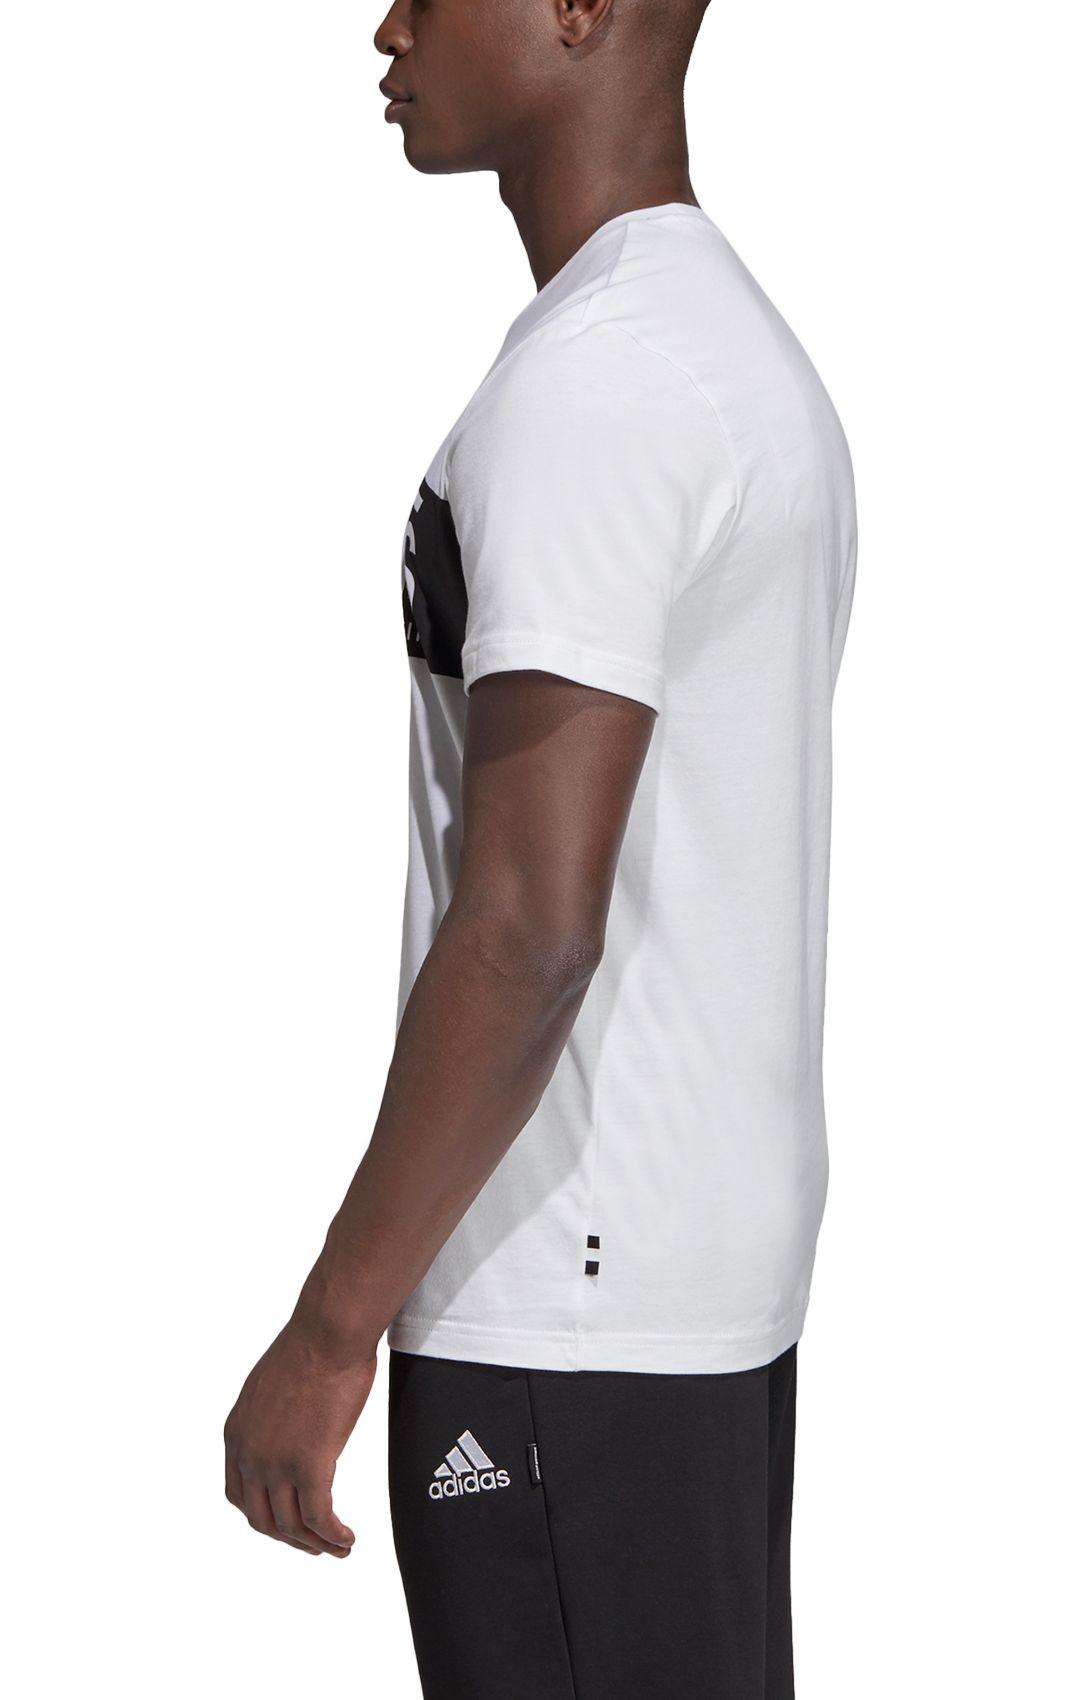 76b5144d2 adidas Men's Juventus DNA Graphic White T-Shirt. noImageFound. Previous. 1.  2. 3